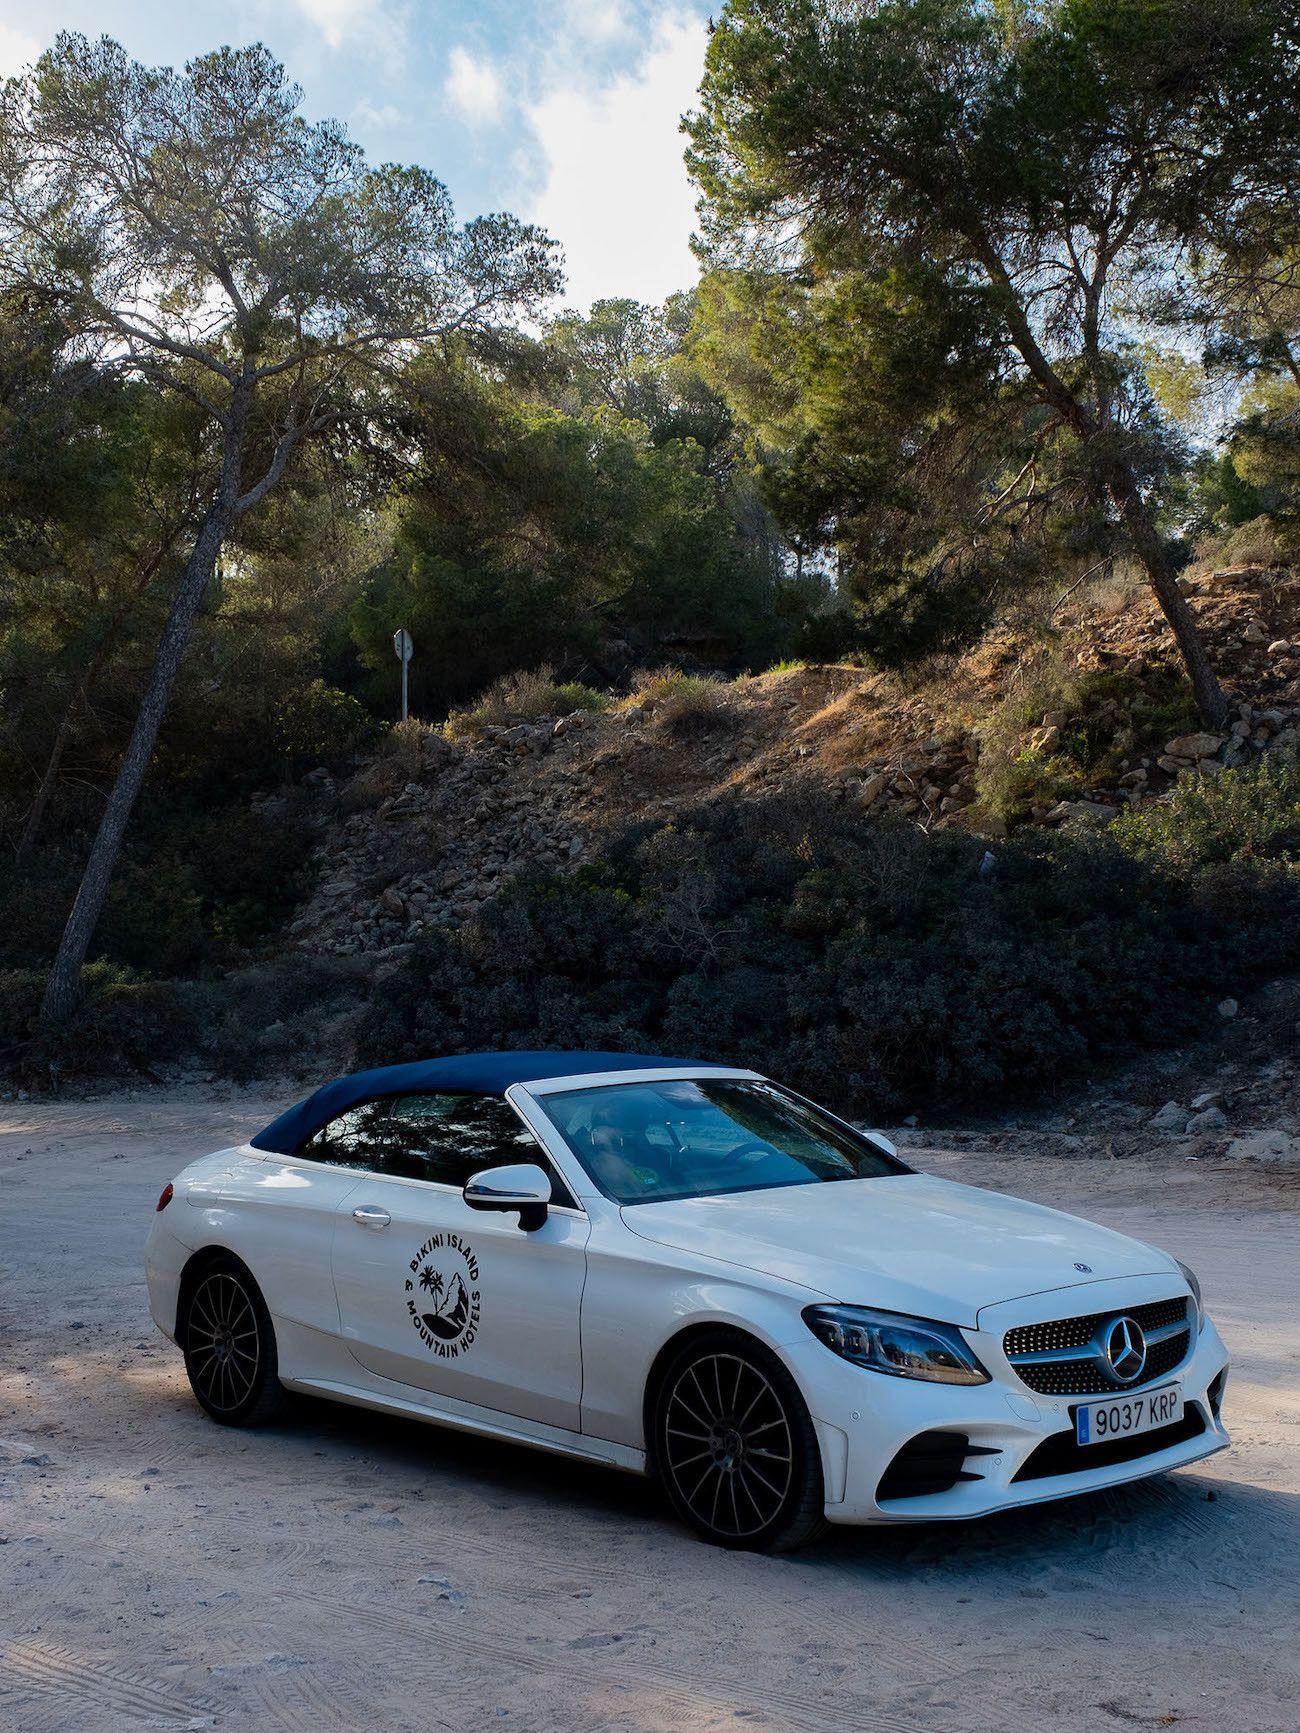 Foodblog About Fuel, Bikini Island & Mountain Hotels, Mercedes AMG